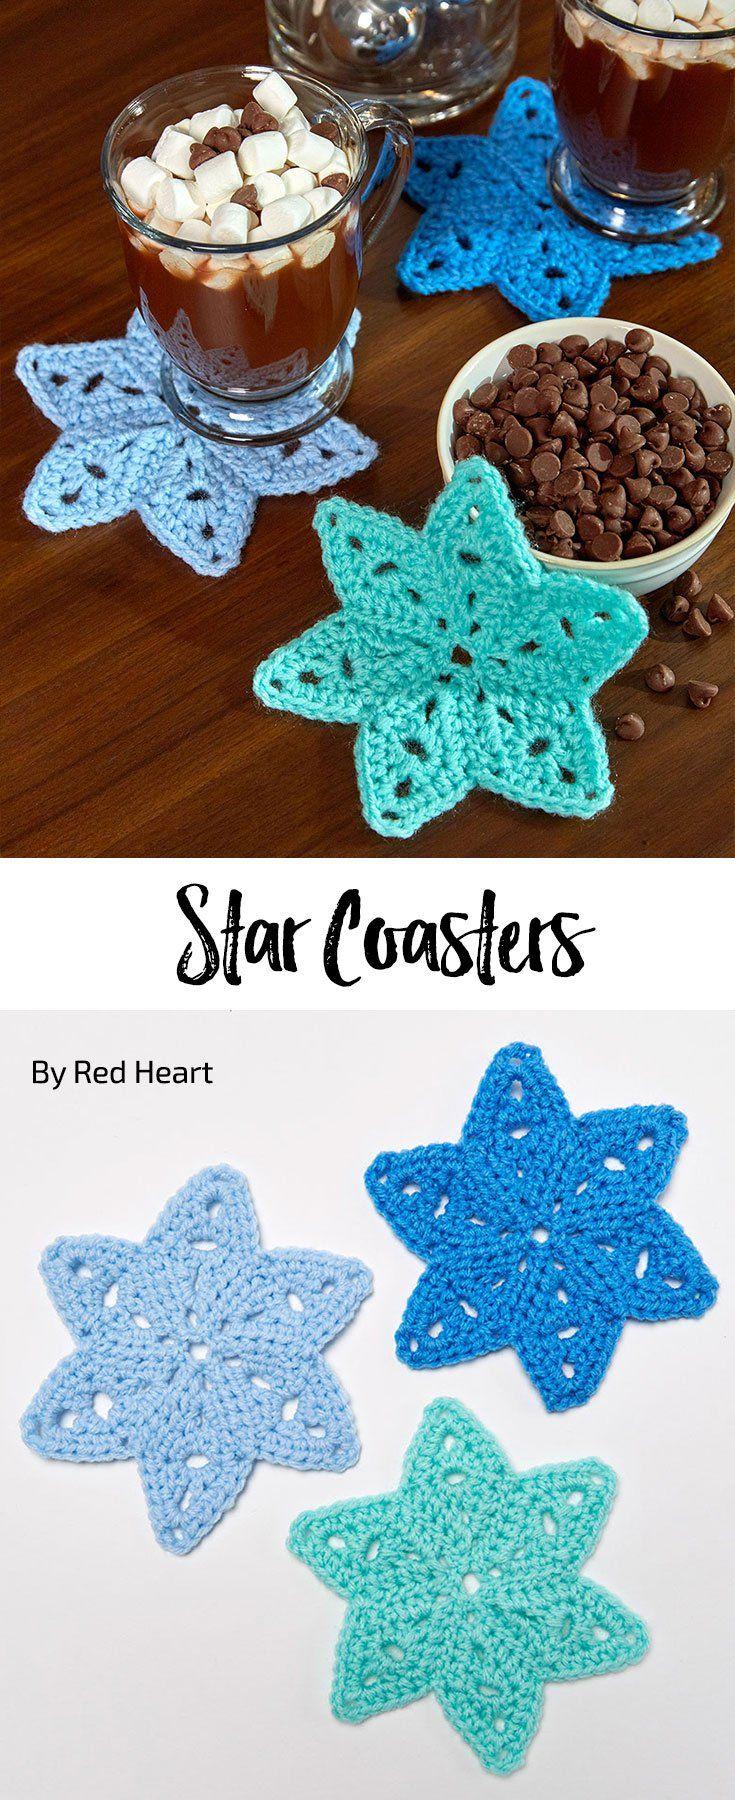 Star Coasters free crochet pattern in Super Saver.